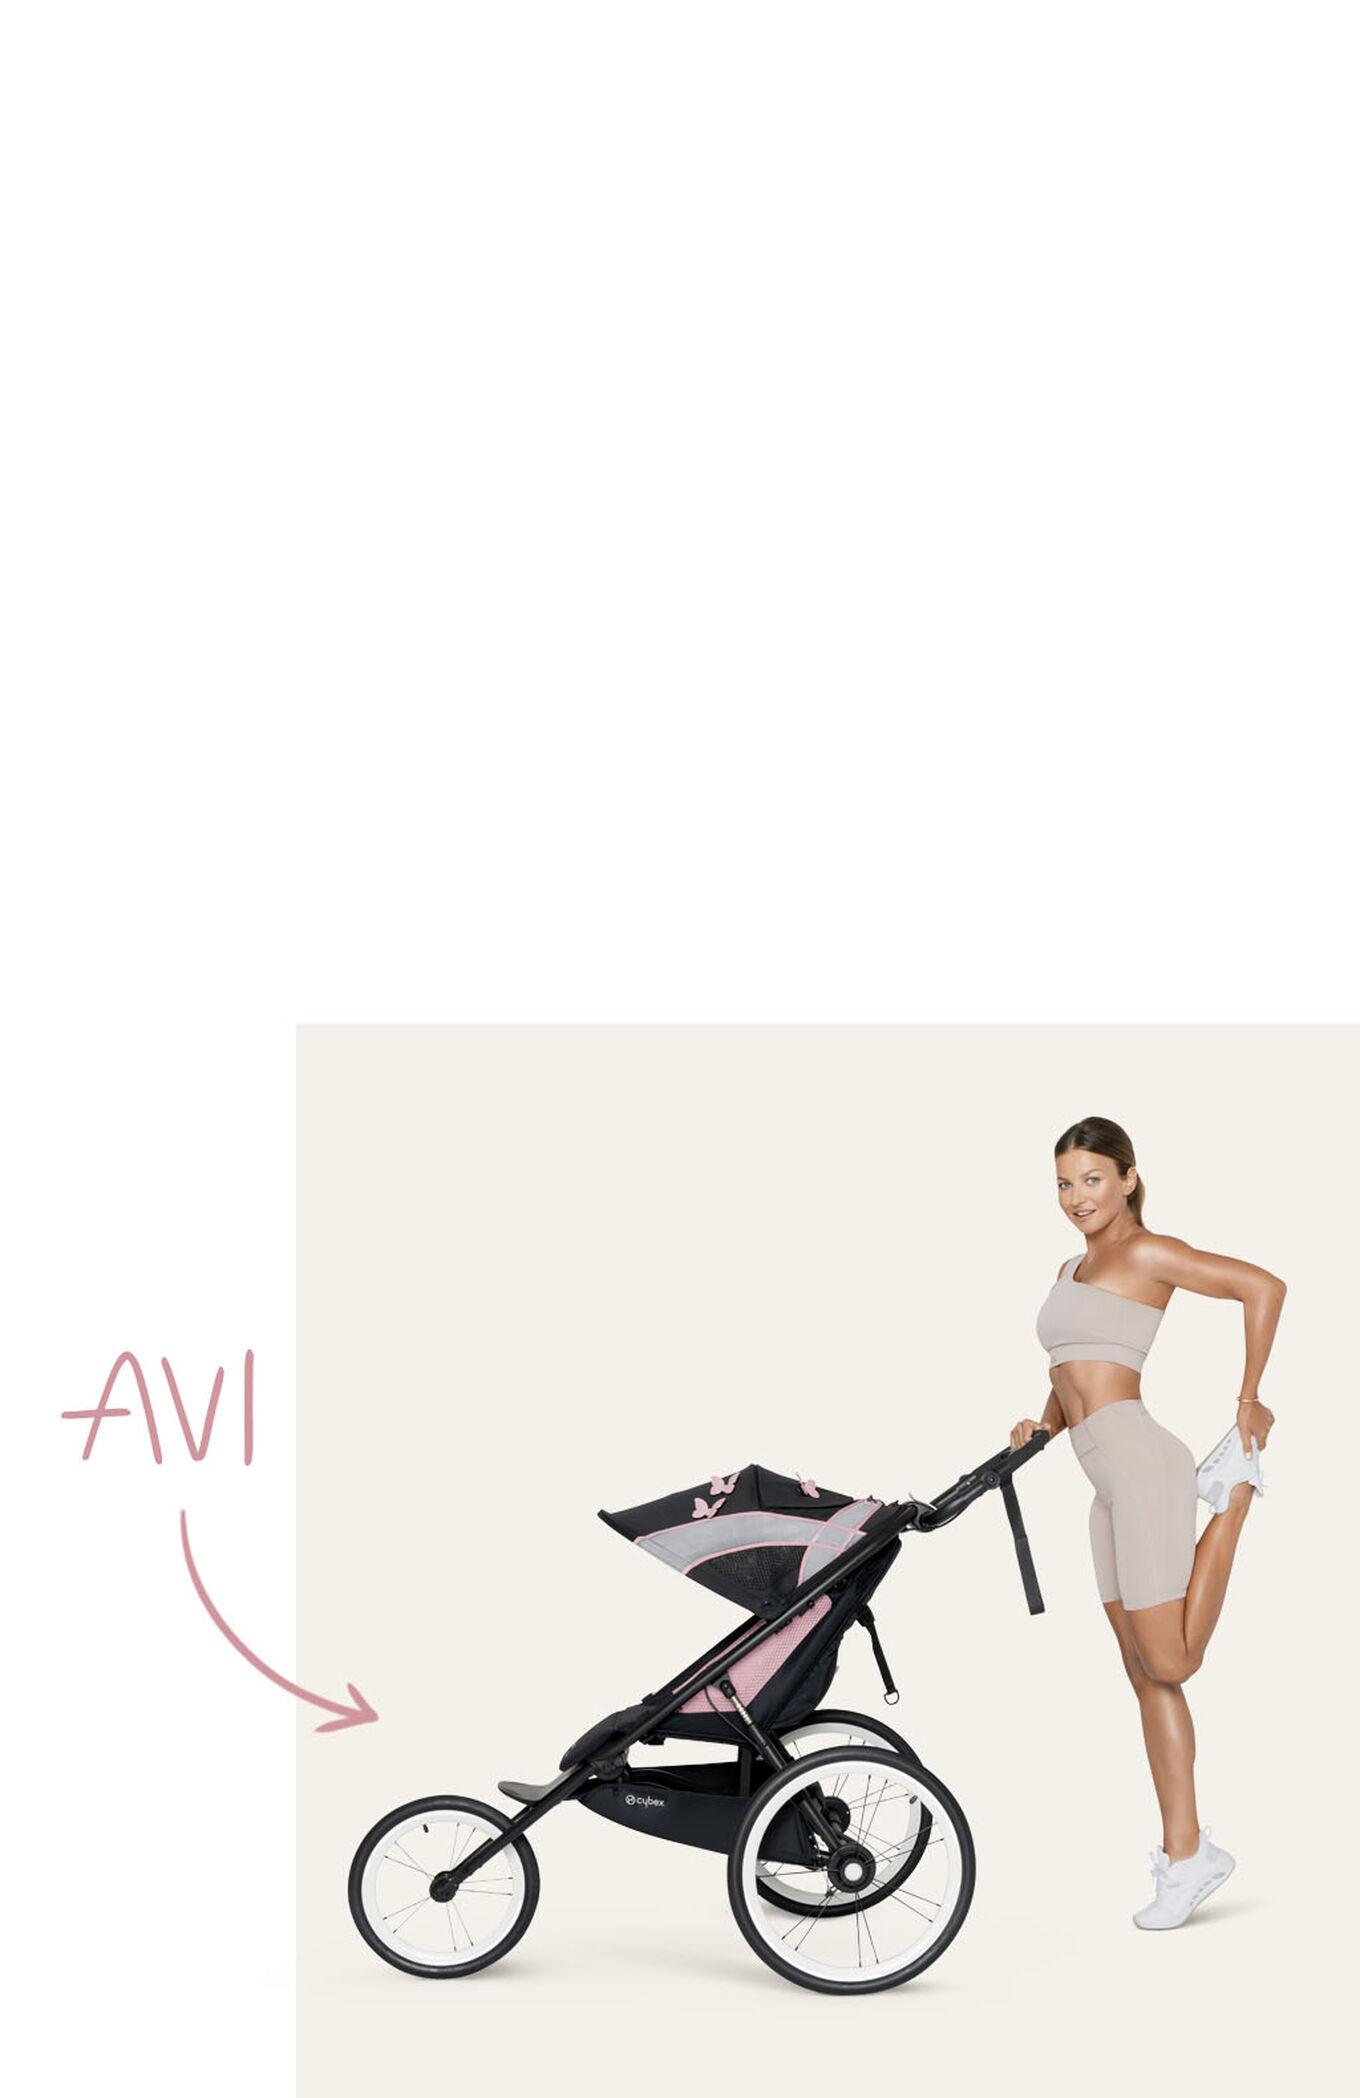 Cybex Gold by Anna Lewandowska Sport Collection AVI Jogging Stroller